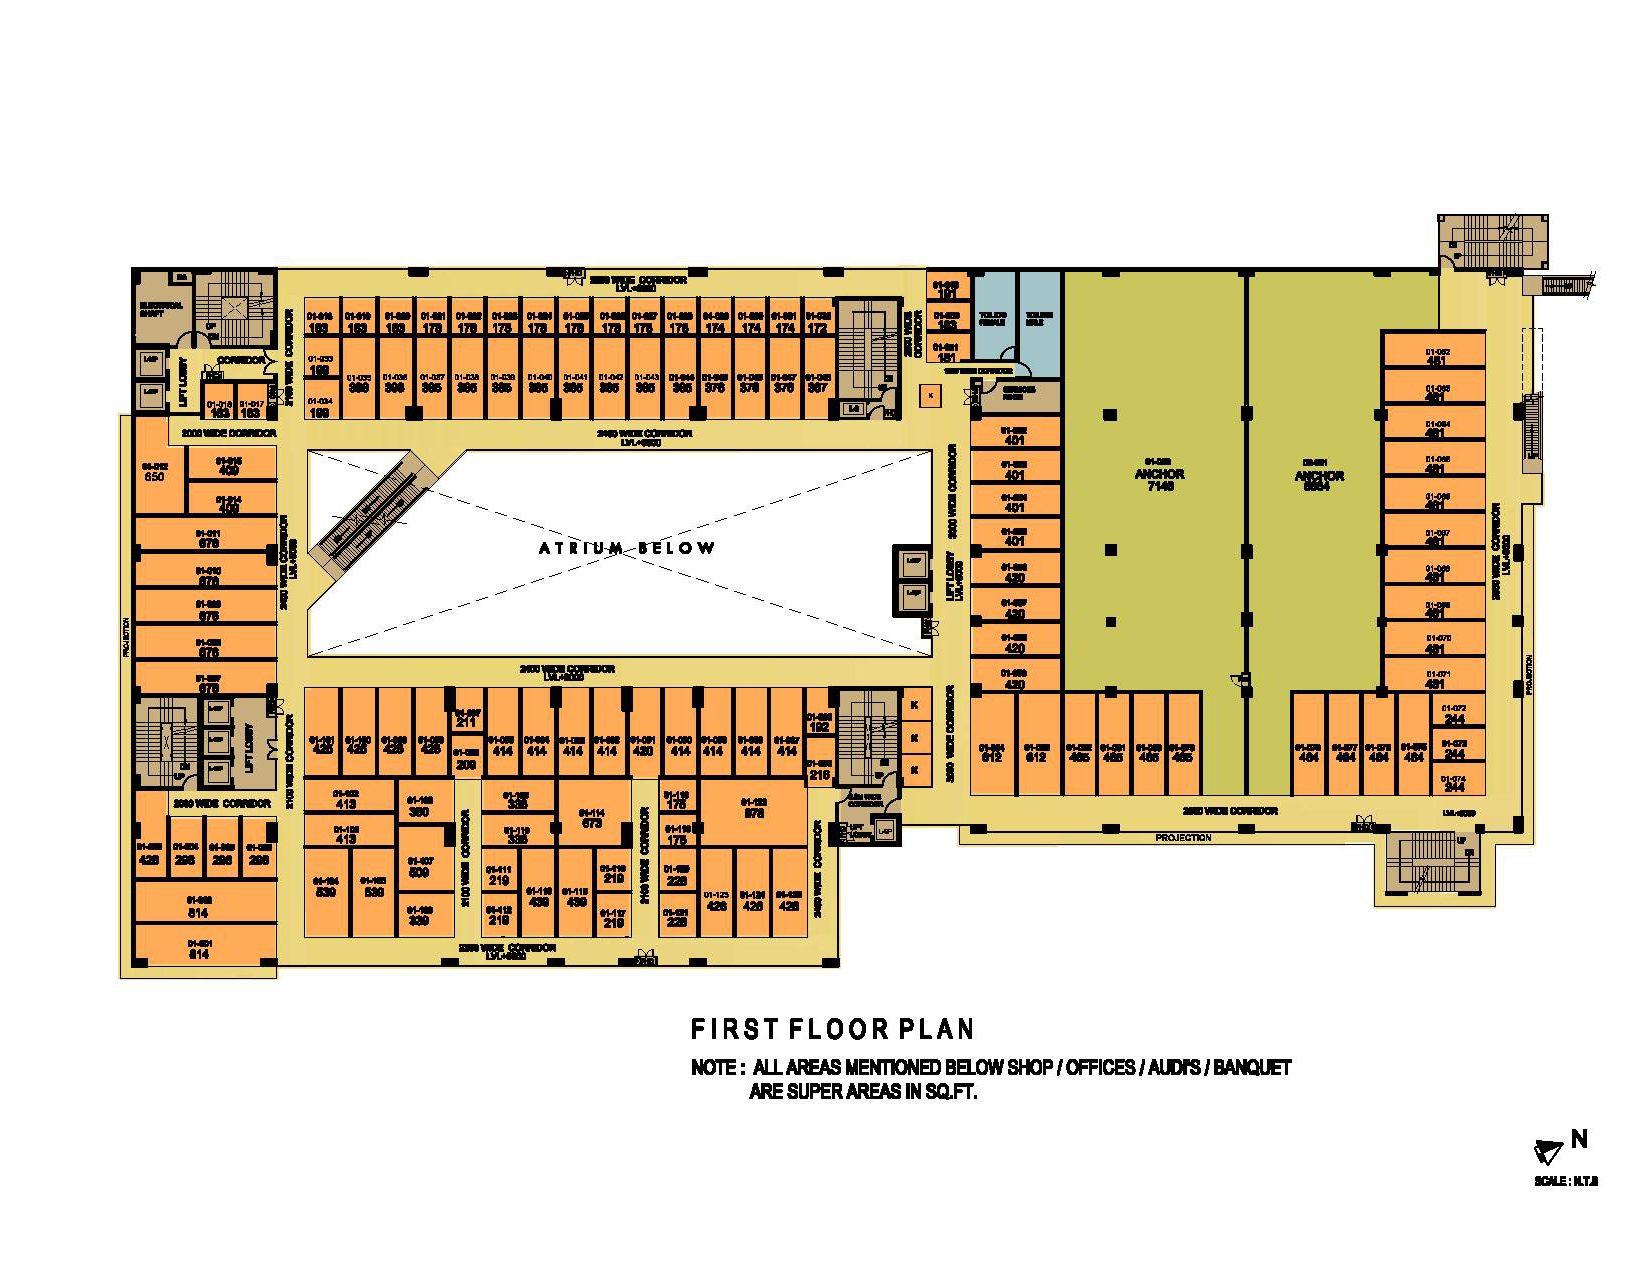 ithum galleria first floor plan